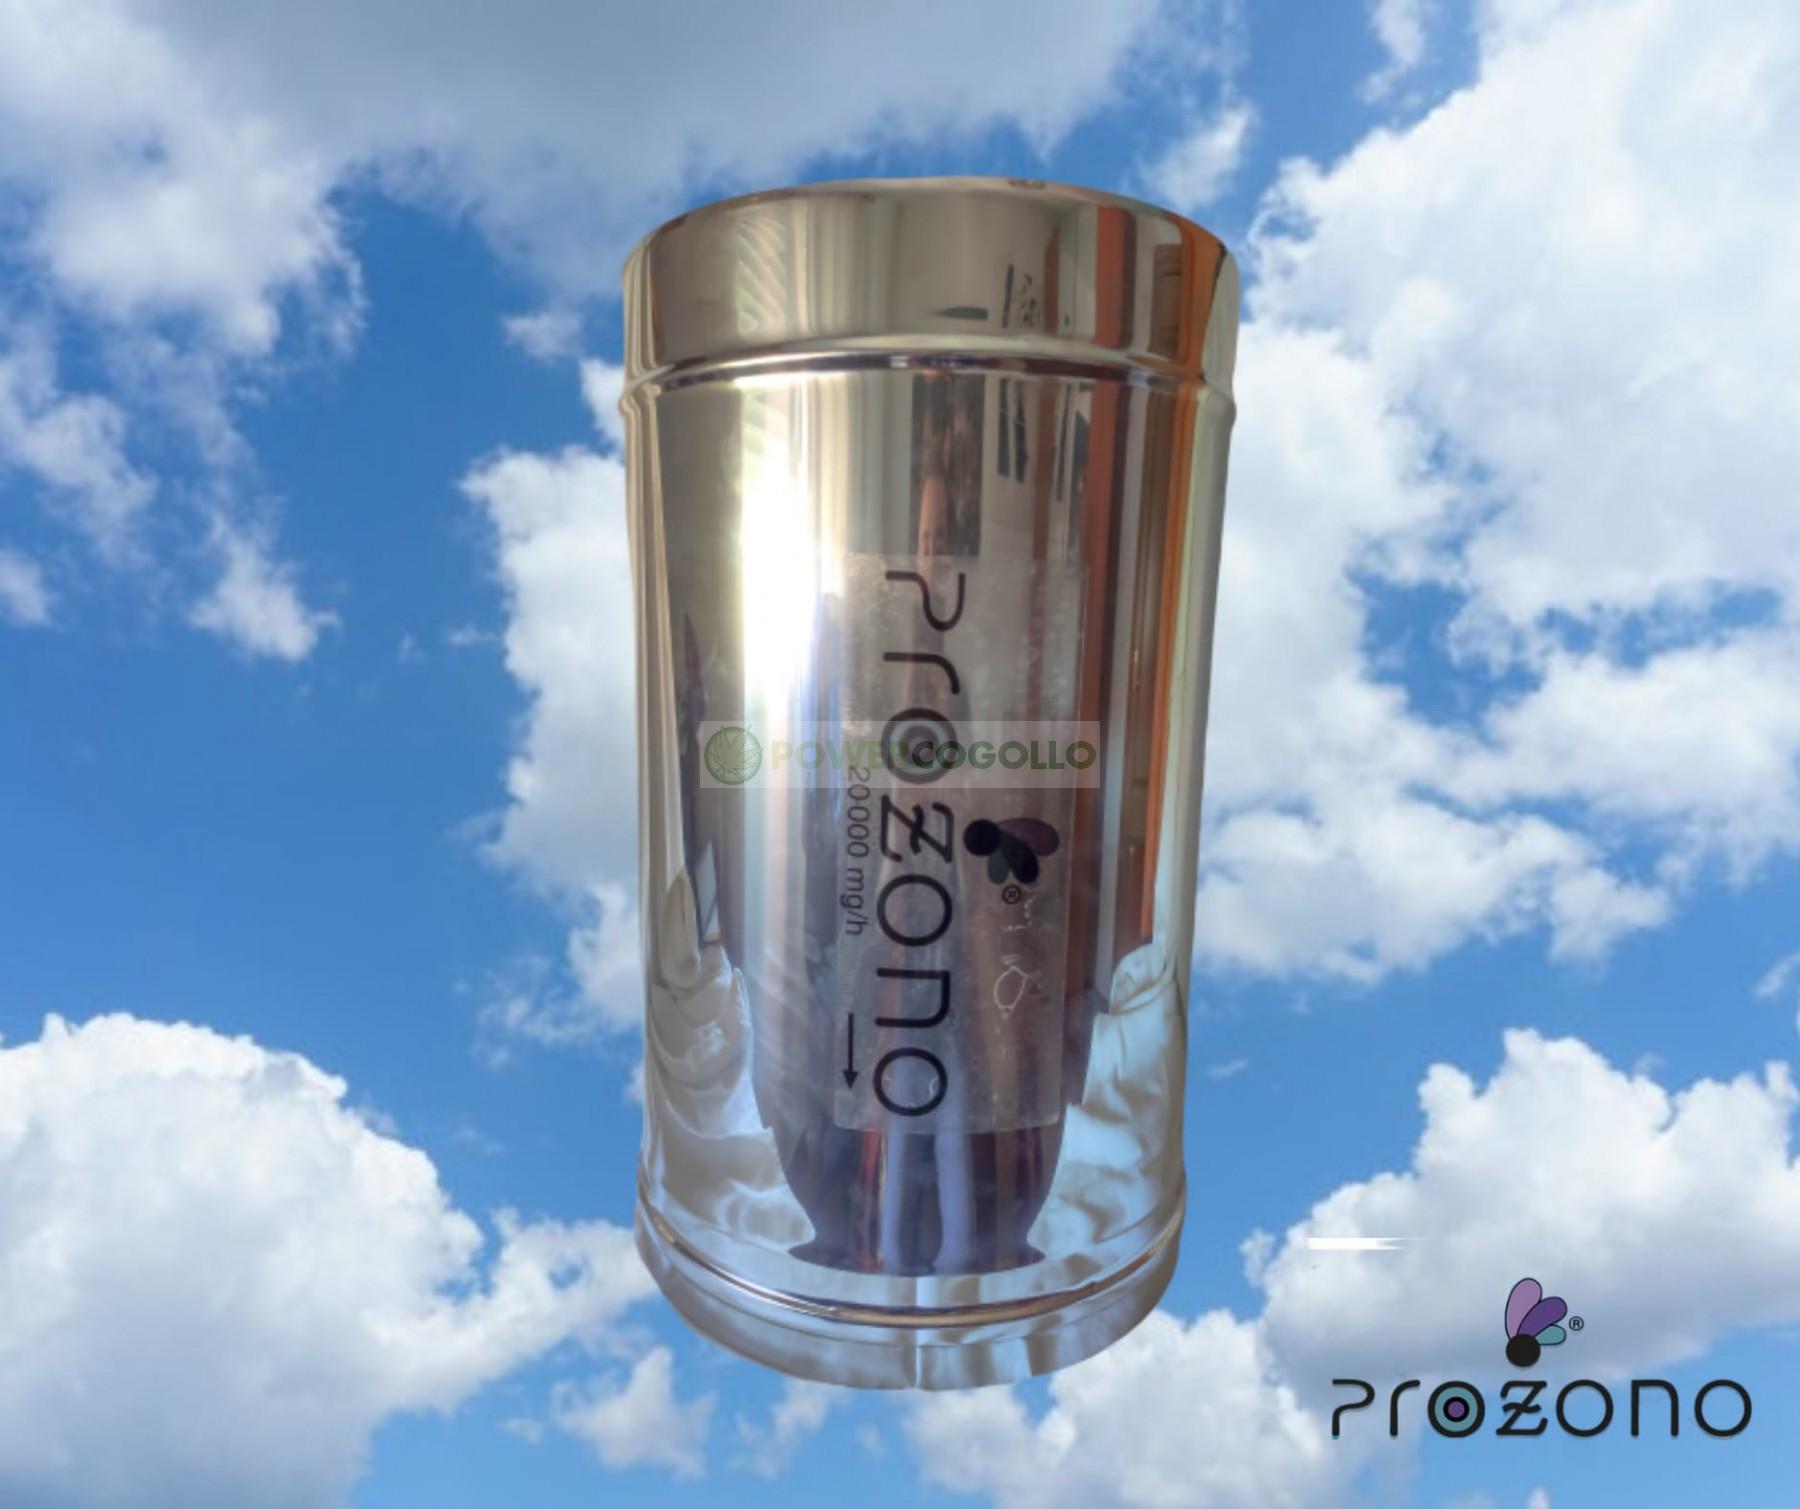 Ozonizador Prozono de Conducto 315mm 10000mg/h 0